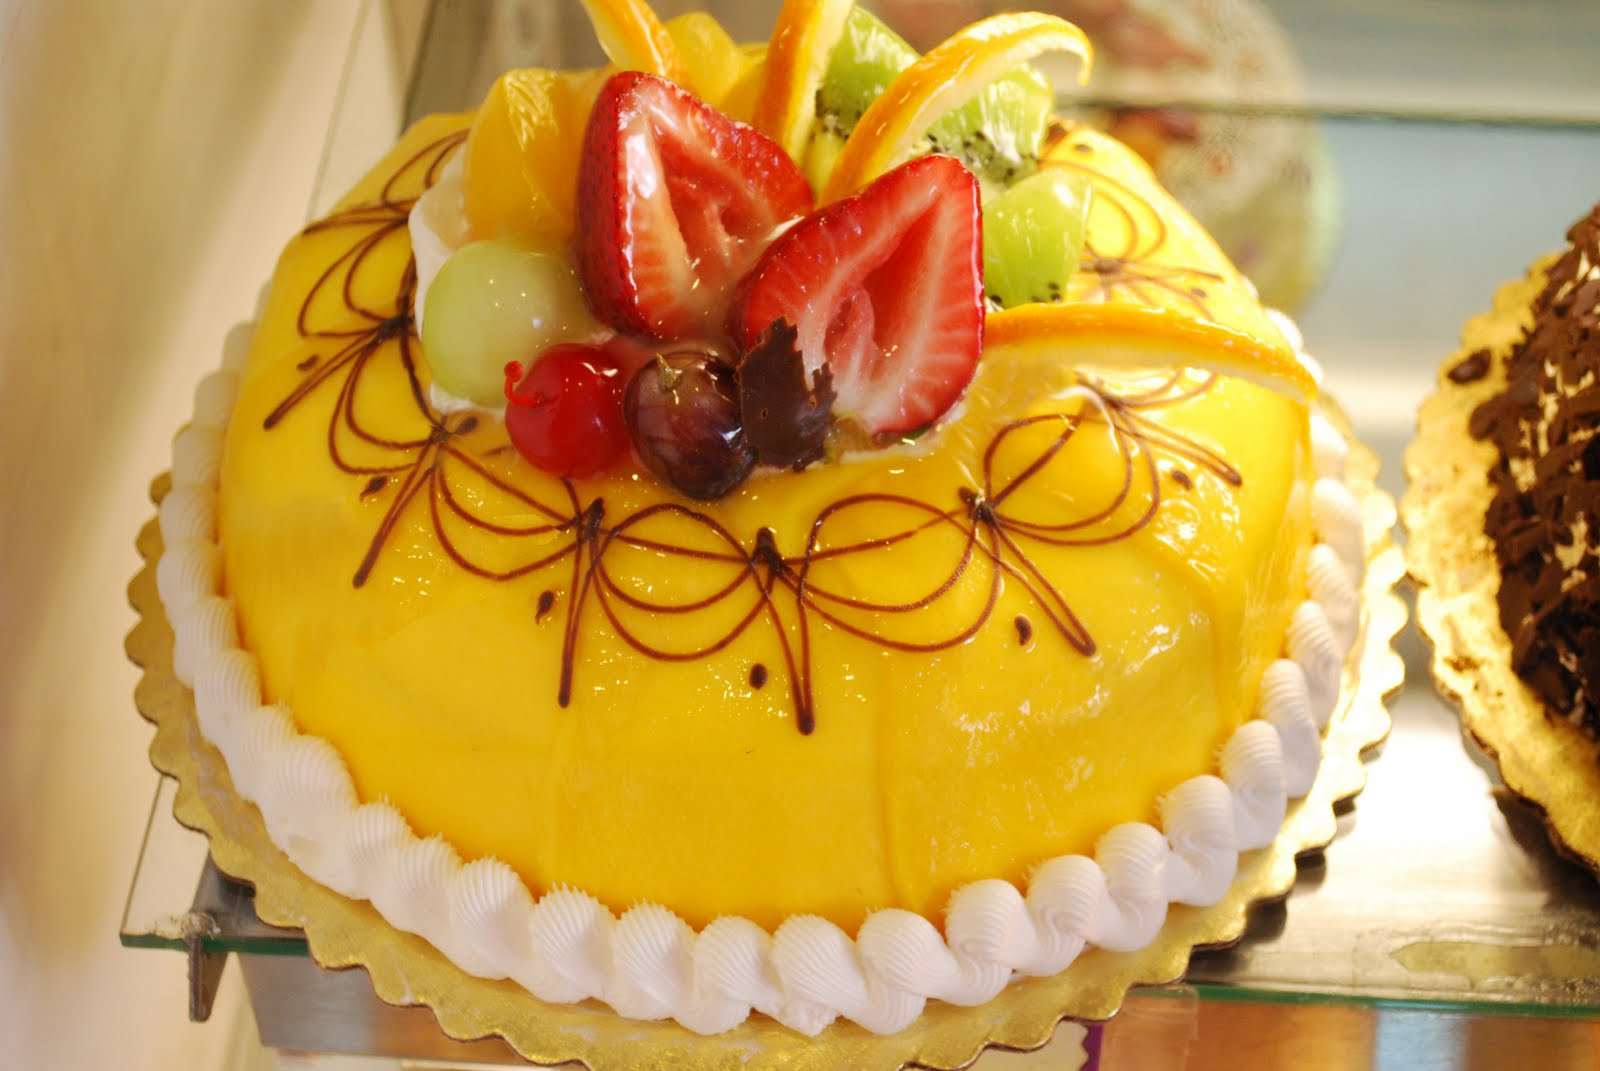 Cake Birthday Images  Happy Birthday eCards Cakes Wishes SMS Dress Recipes Poem